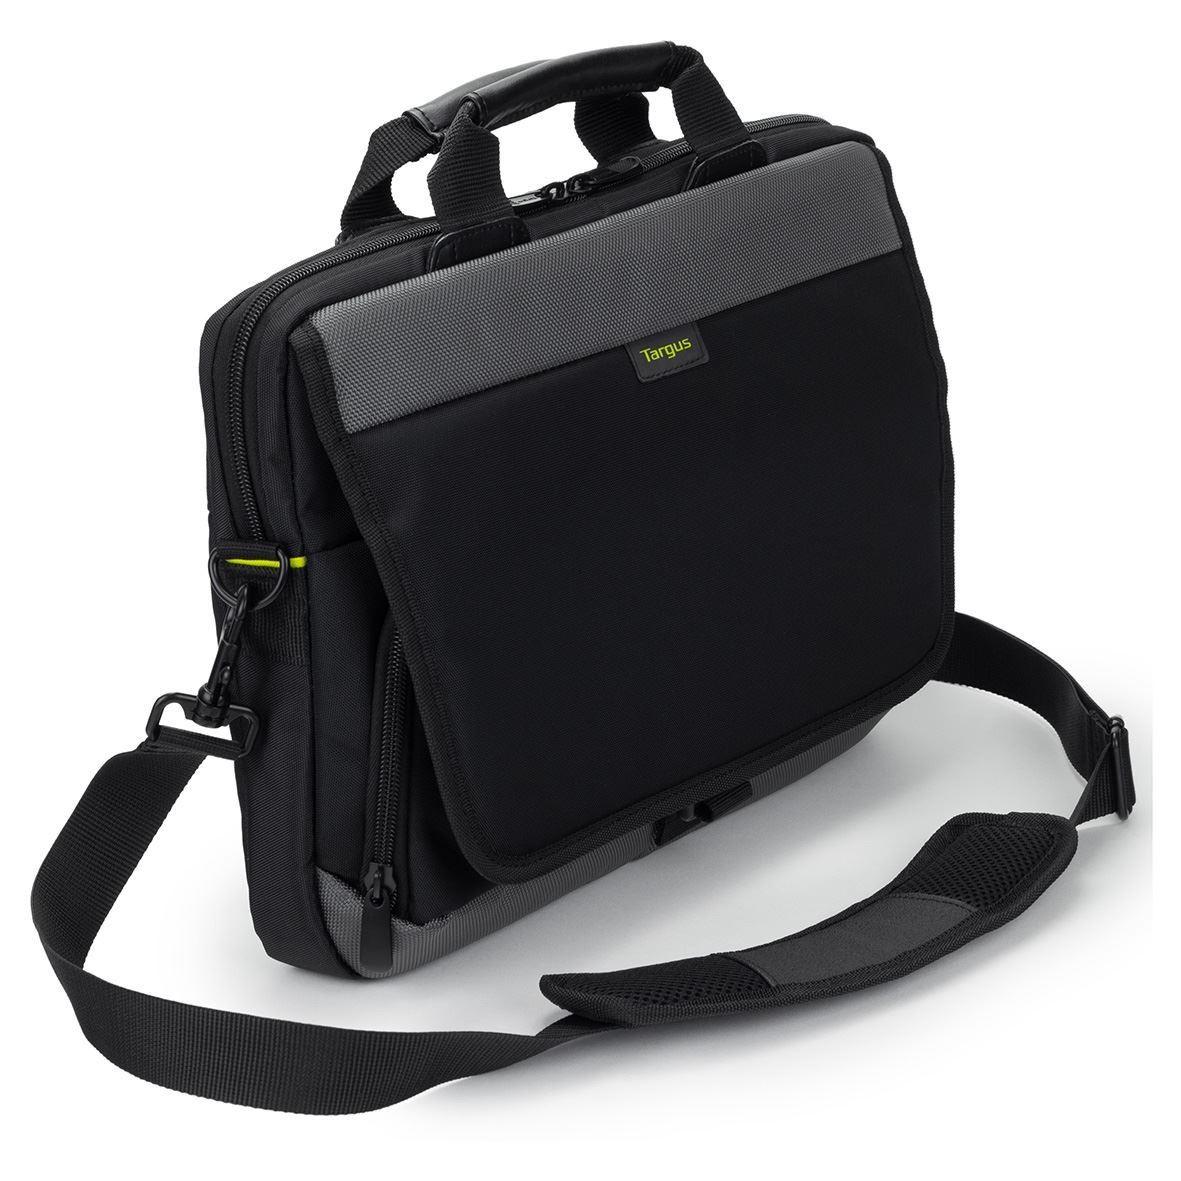 "CityGear 10-12"" Laptop Slim Topload Black"